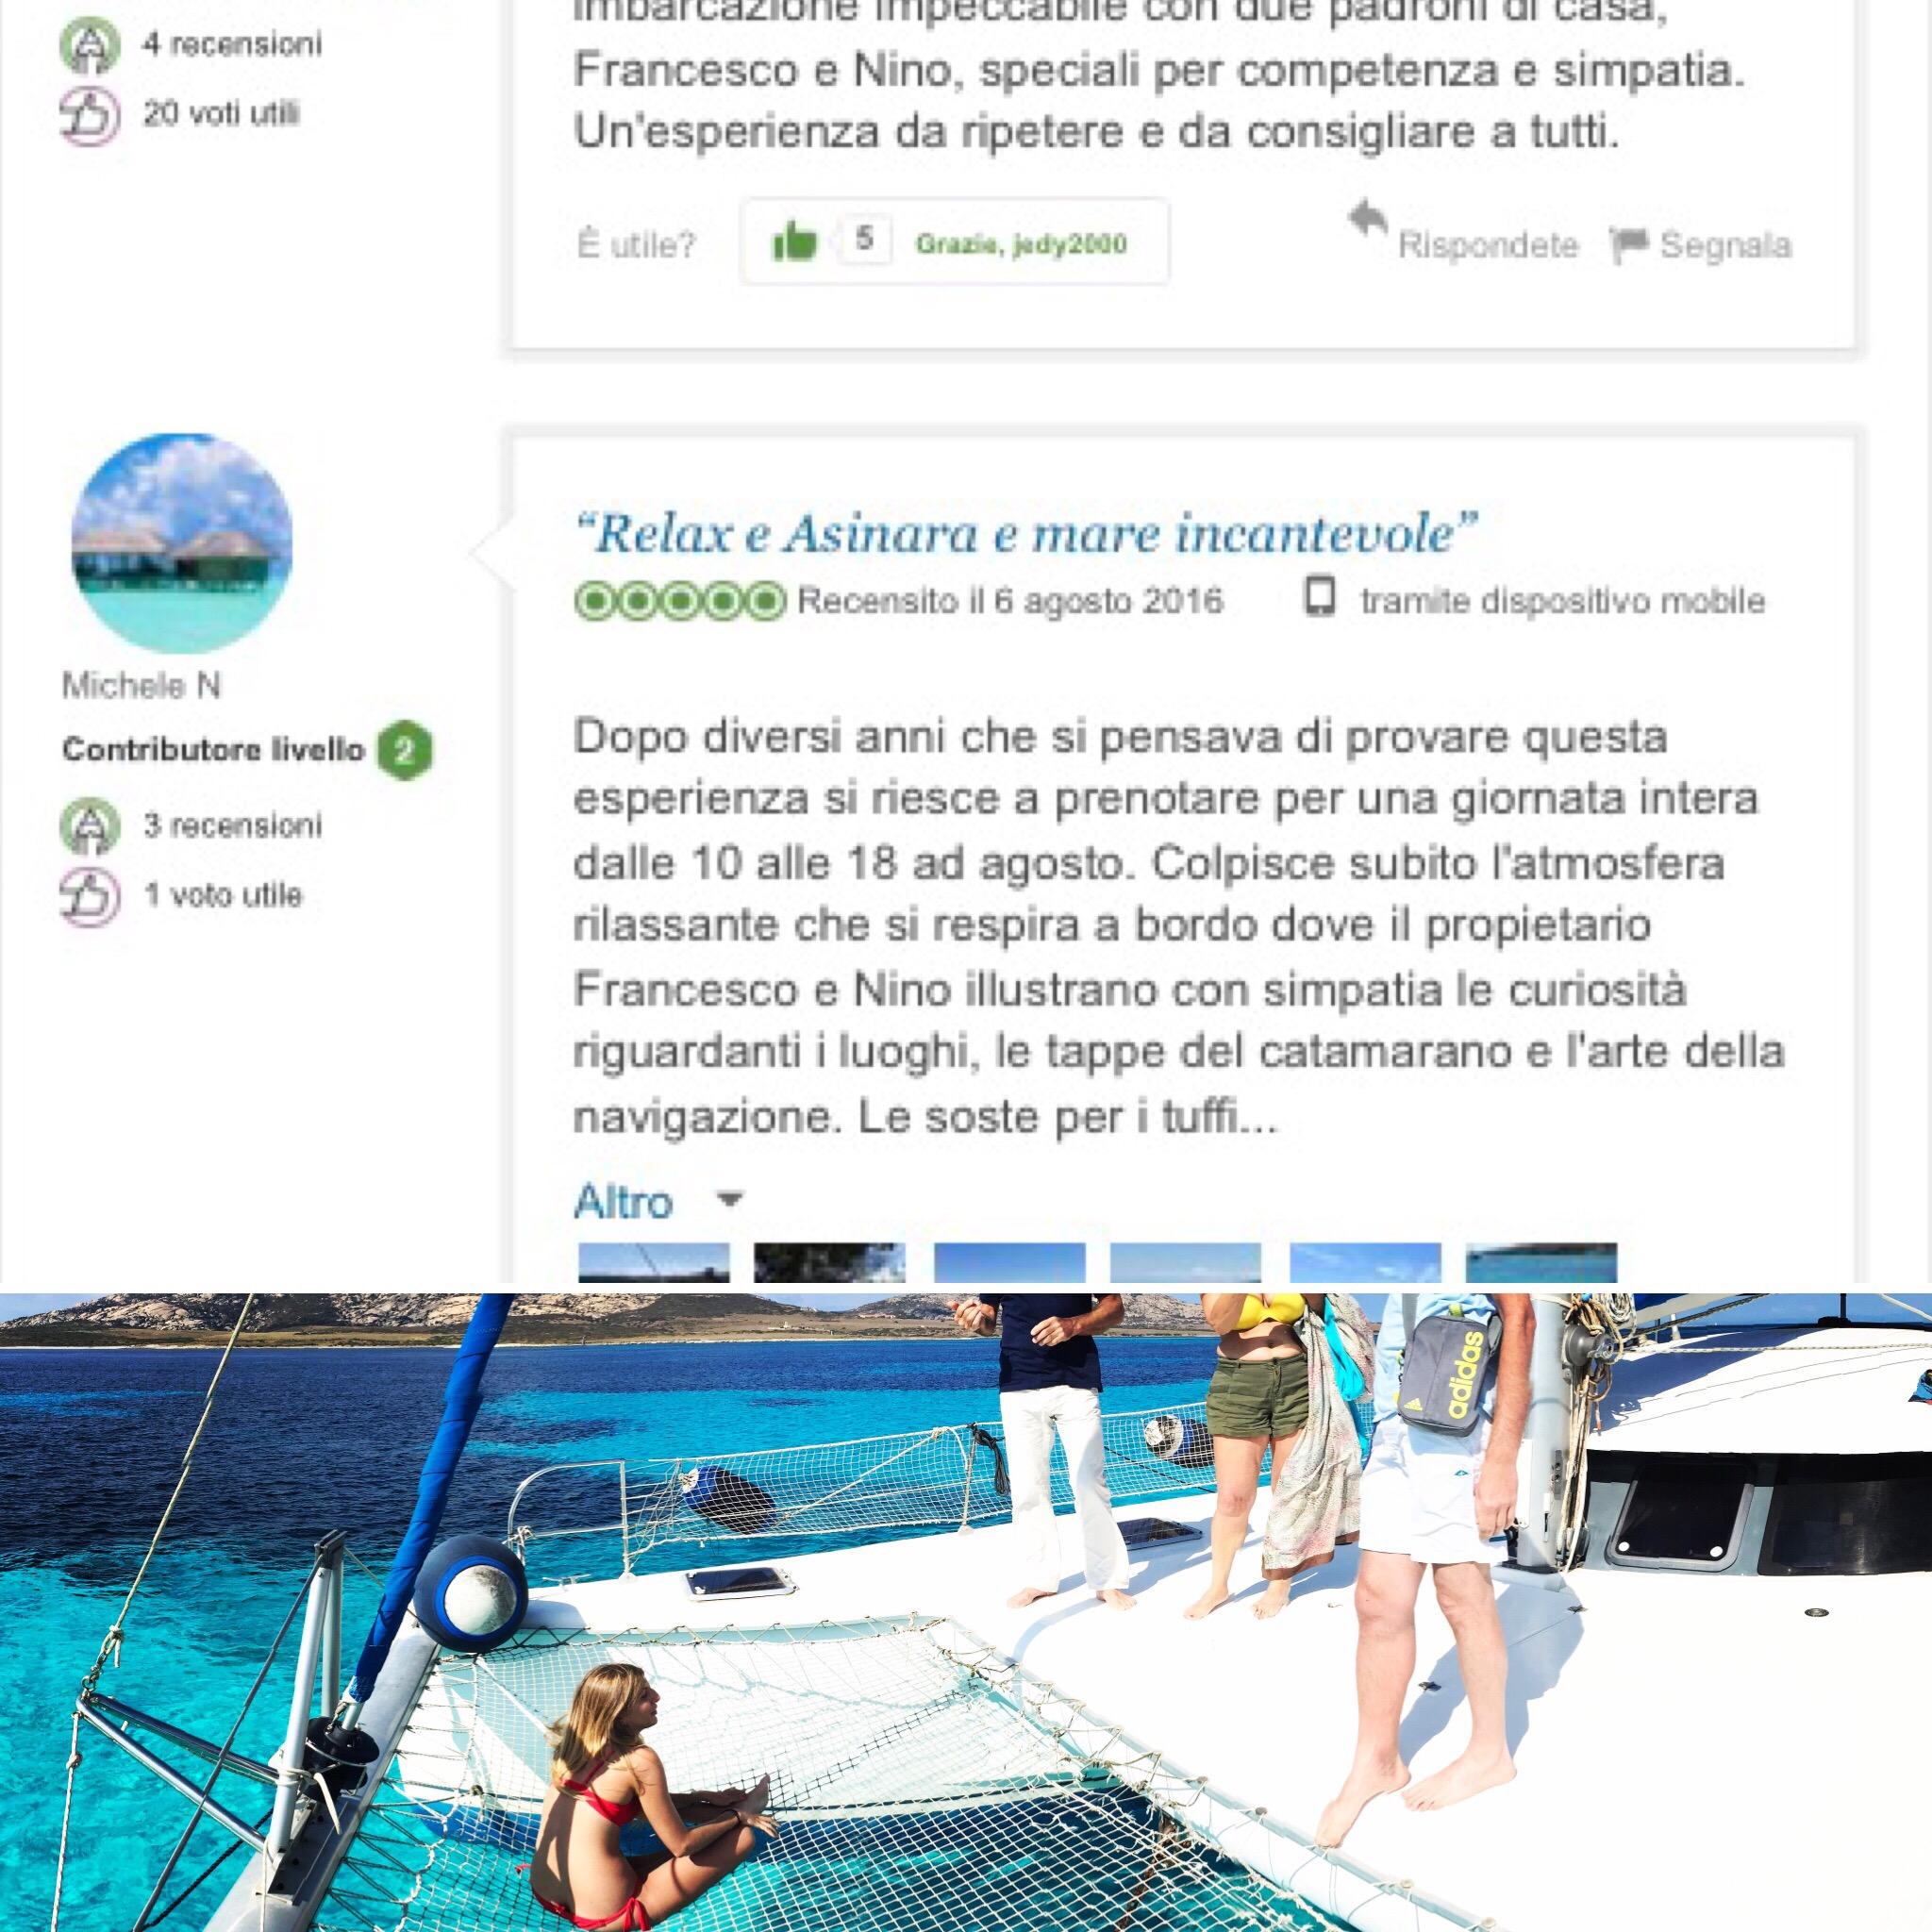 recensioni asinara catamaran escursioni e vacanze in catamarano